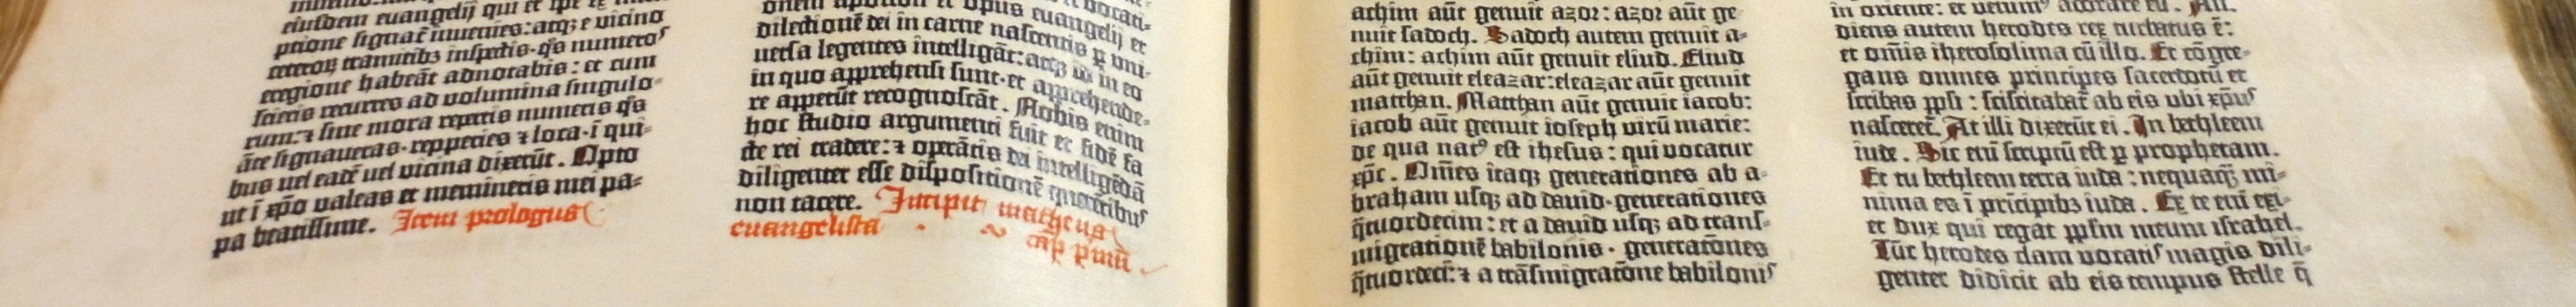 Gutenberg_Bible_(Pelplin_copy)_02-1